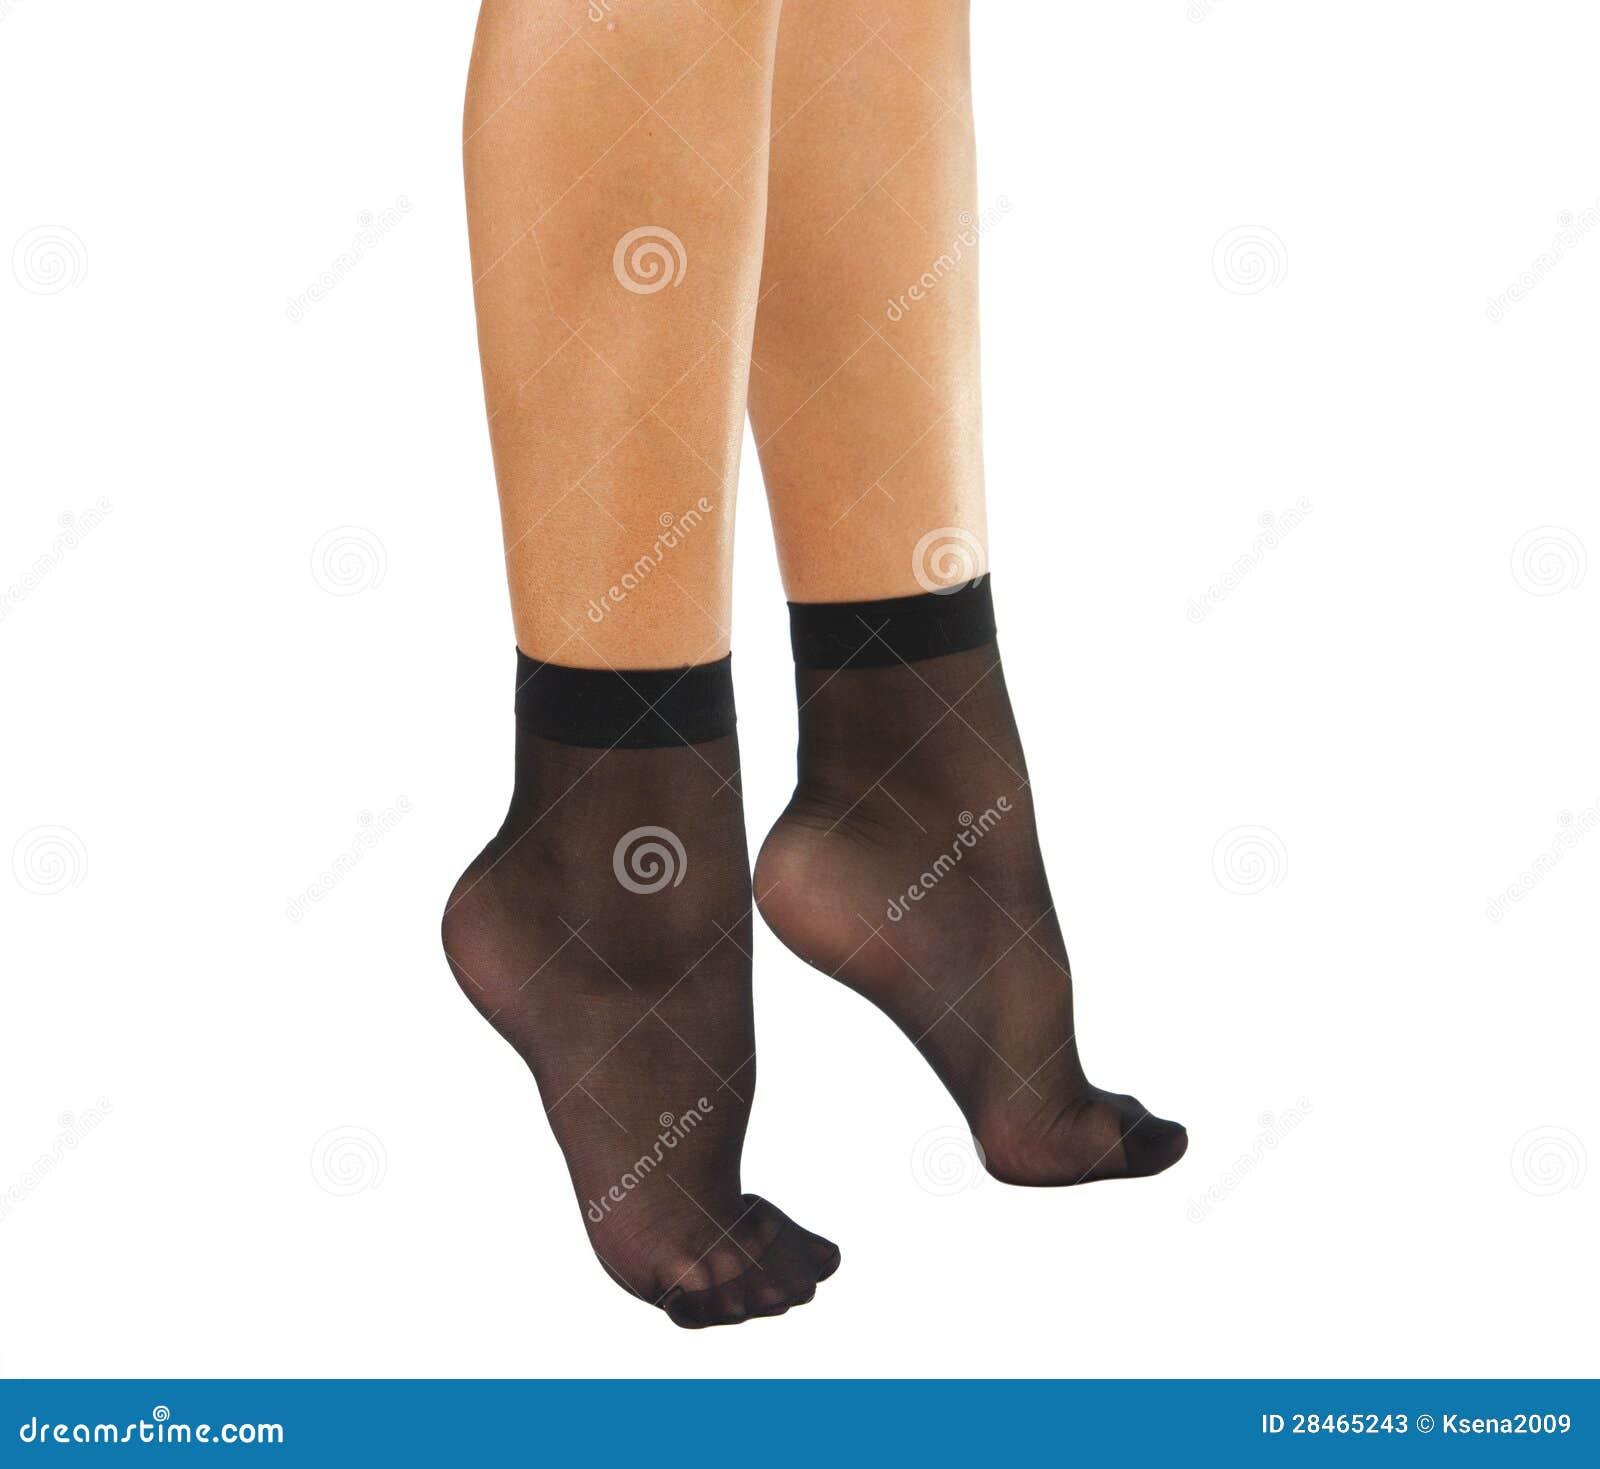 Фото ступней в нейлоне фото 571-215